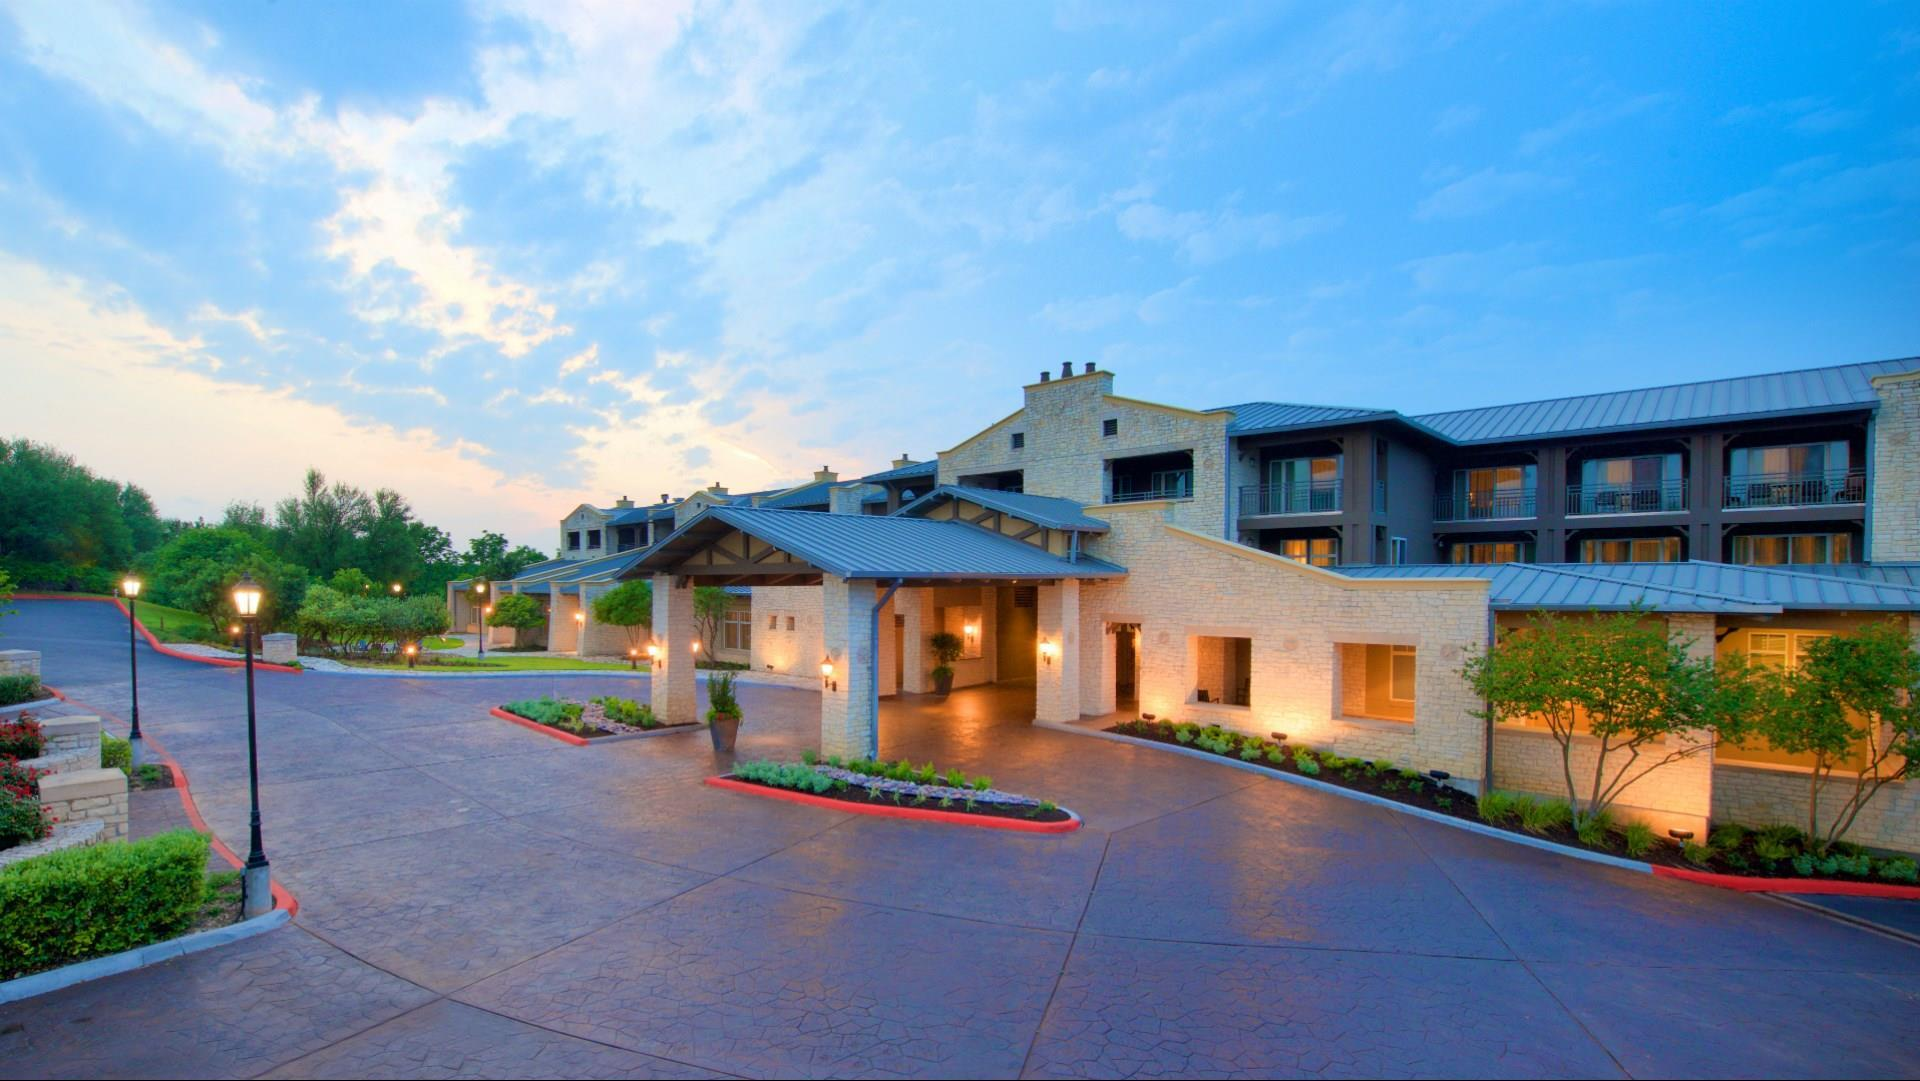 Meetings And Events At Lakeway Resort And Spa, Lakeway, TX, US